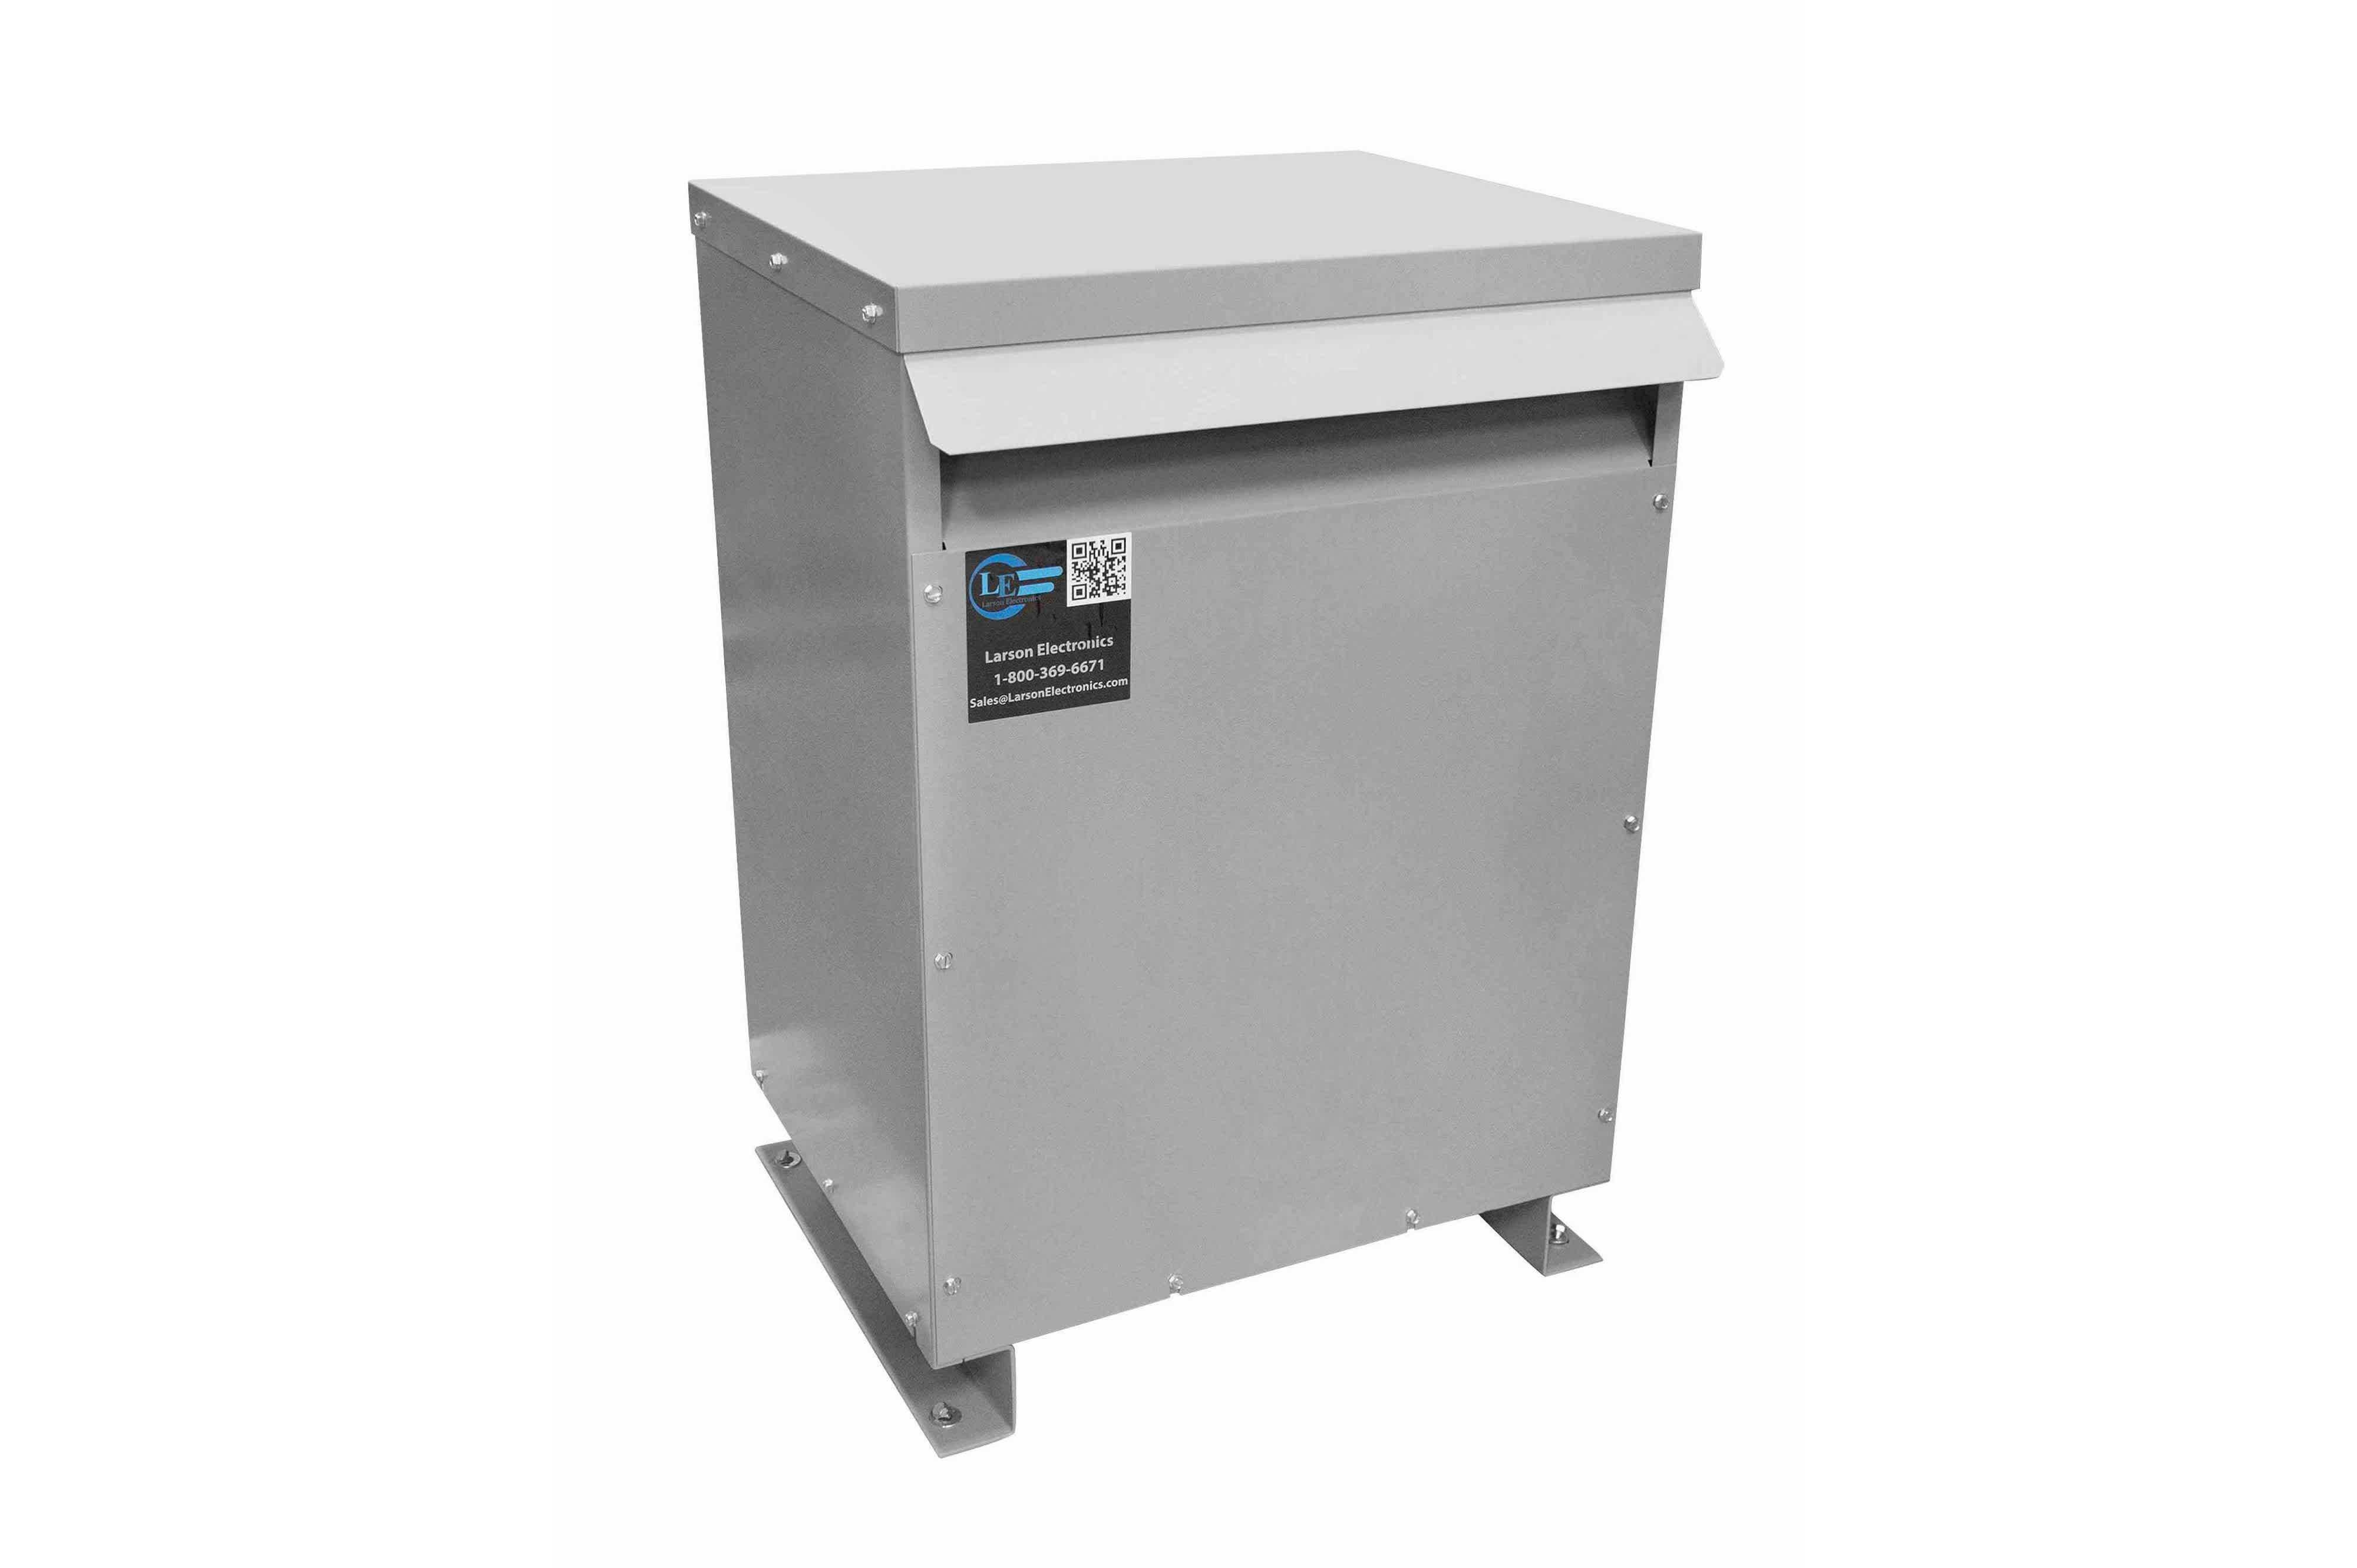 29 kVA 3PH Isolation Transformer, 208V Wye Primary, 480Y/277 Wye-N Secondary, N3R, Ventilated, 60 Hz